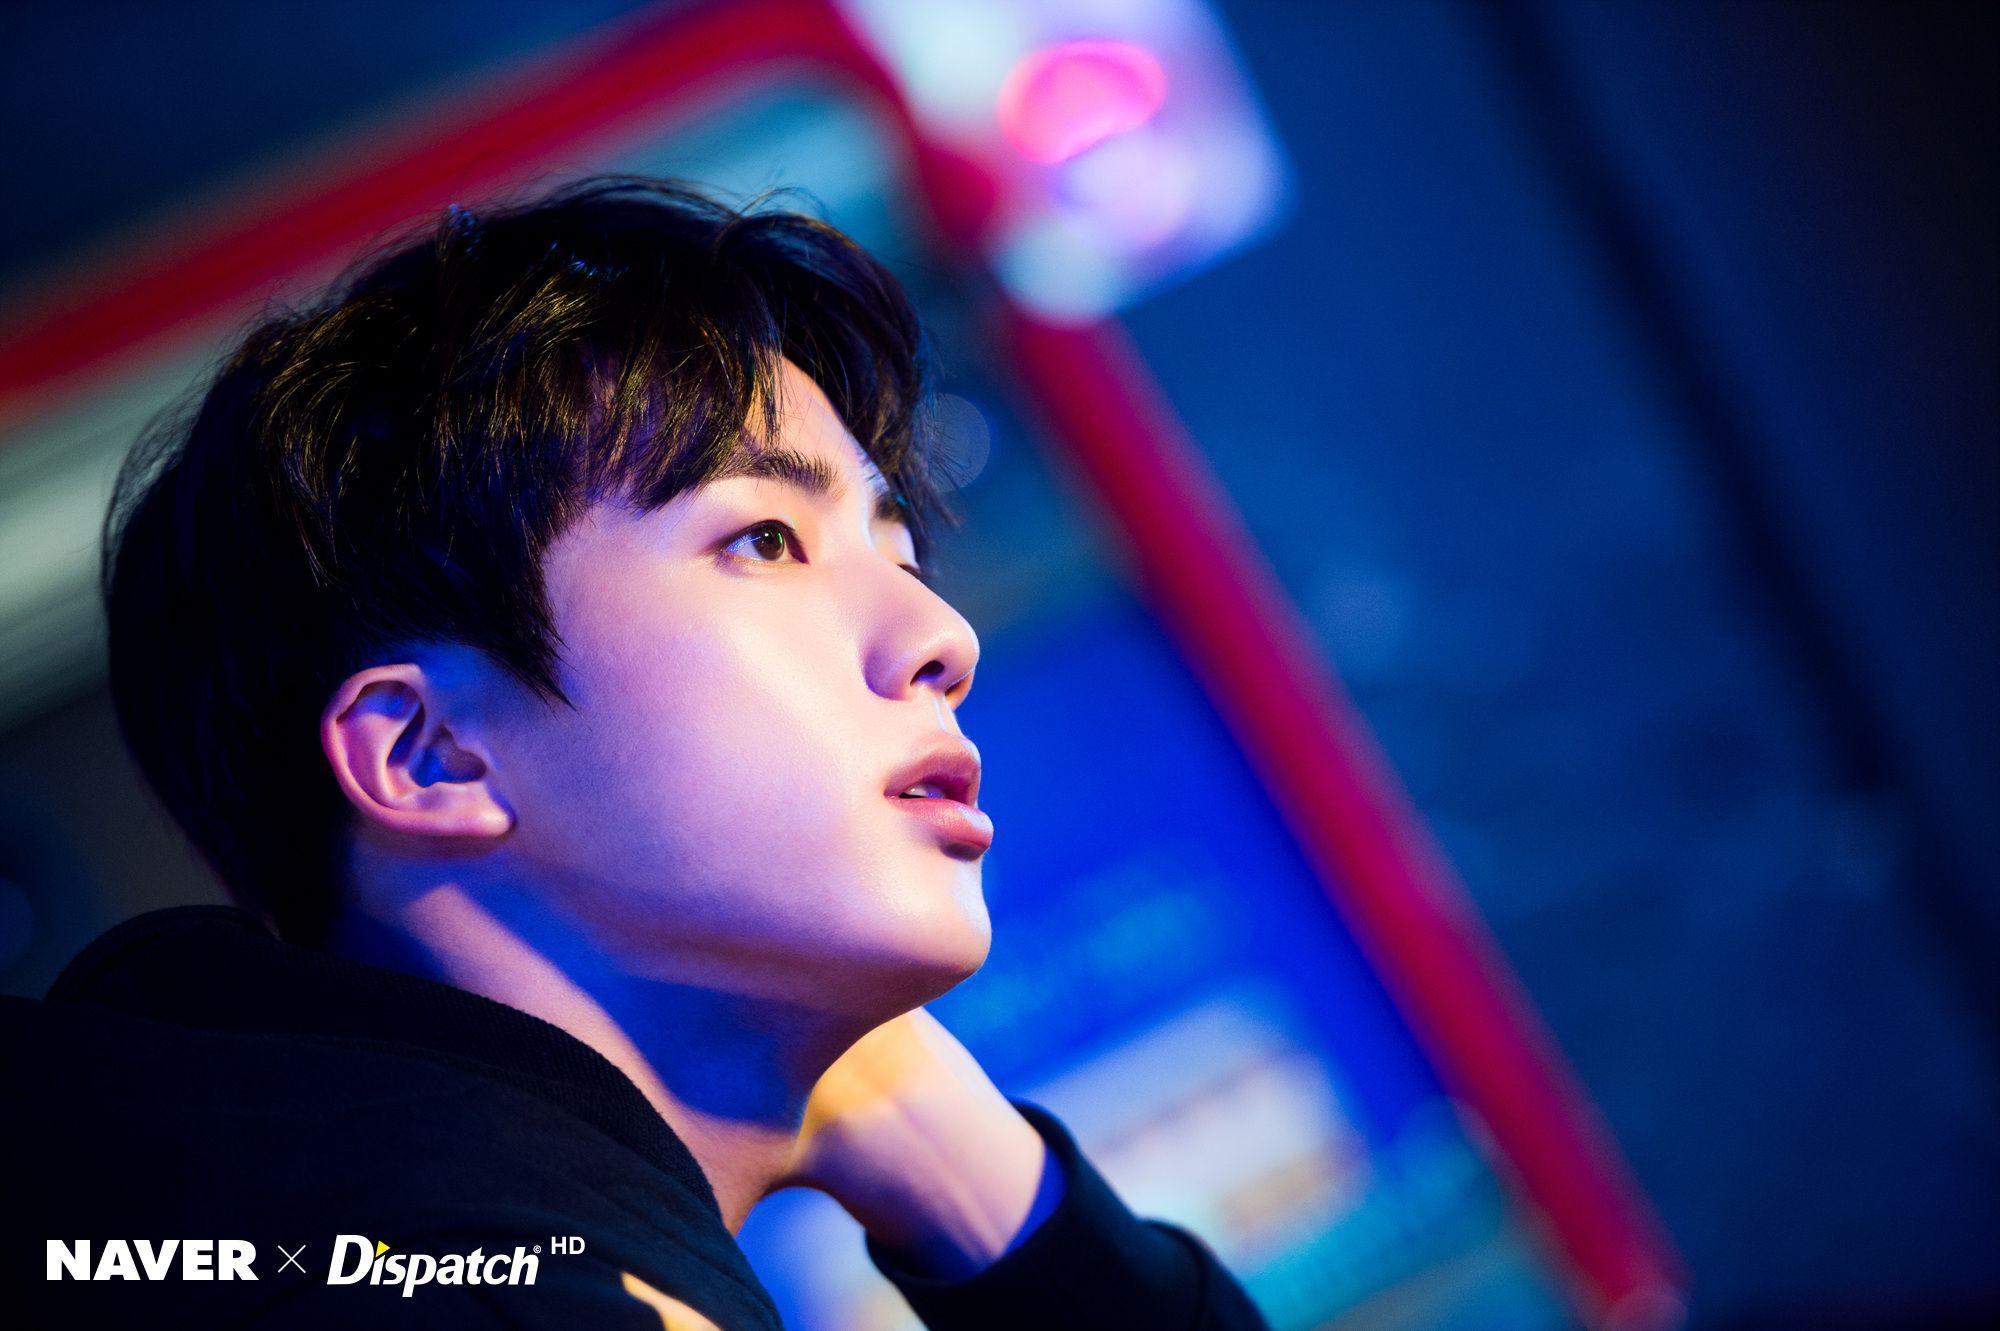 Jin Love Yourself HD 04